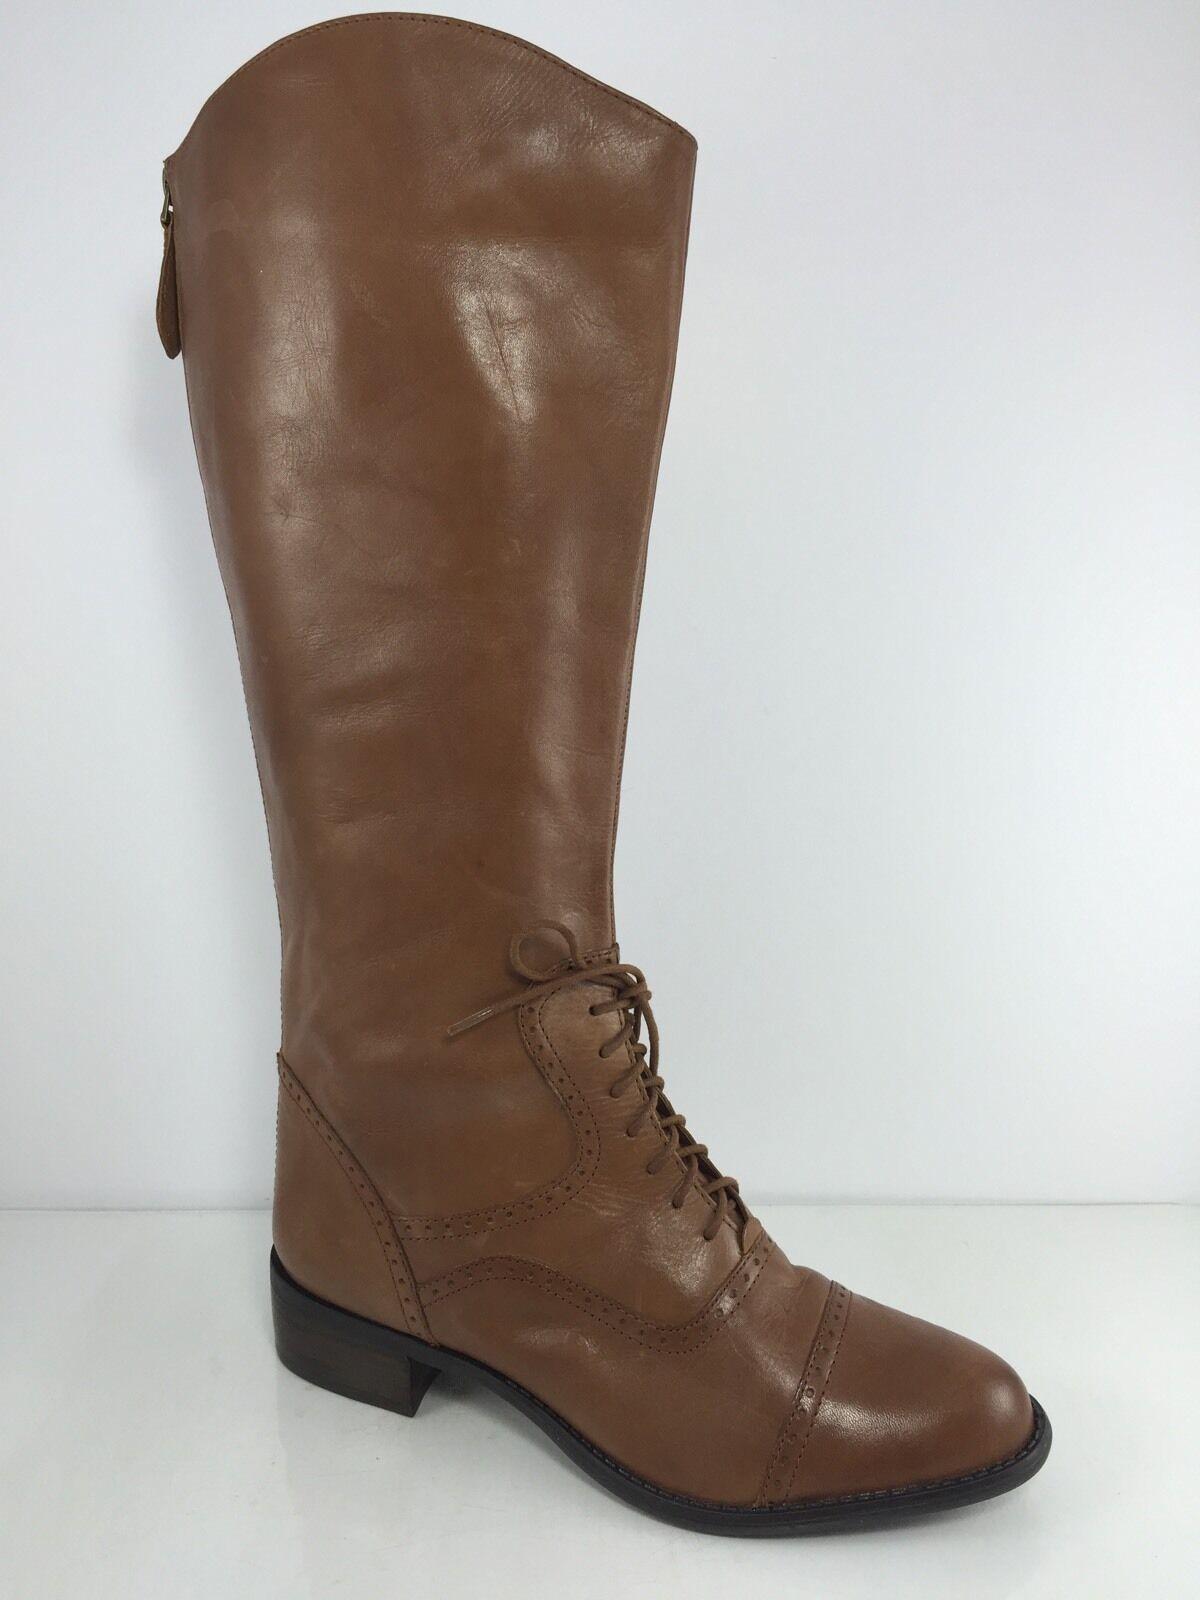 Franco Sarto donna Marronee Leather Knee stivali 10 M